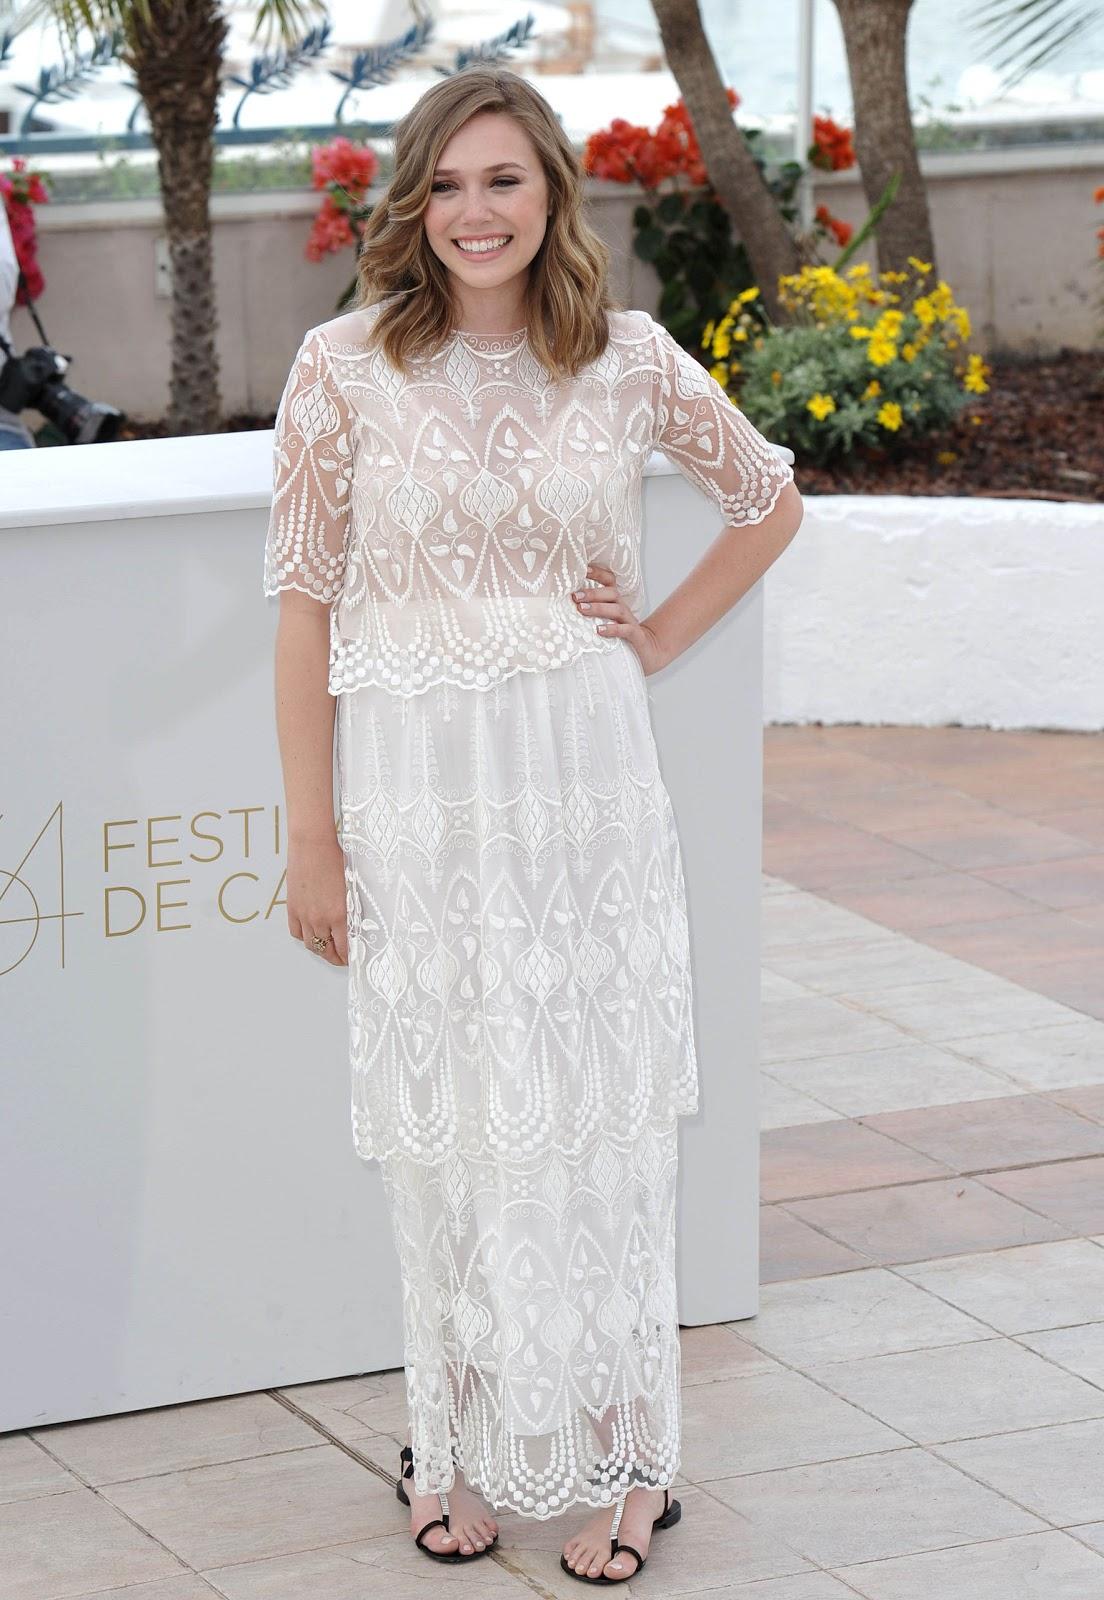 Captain America Civil War actress Elizabeth Olsen at Cannes Film Festival